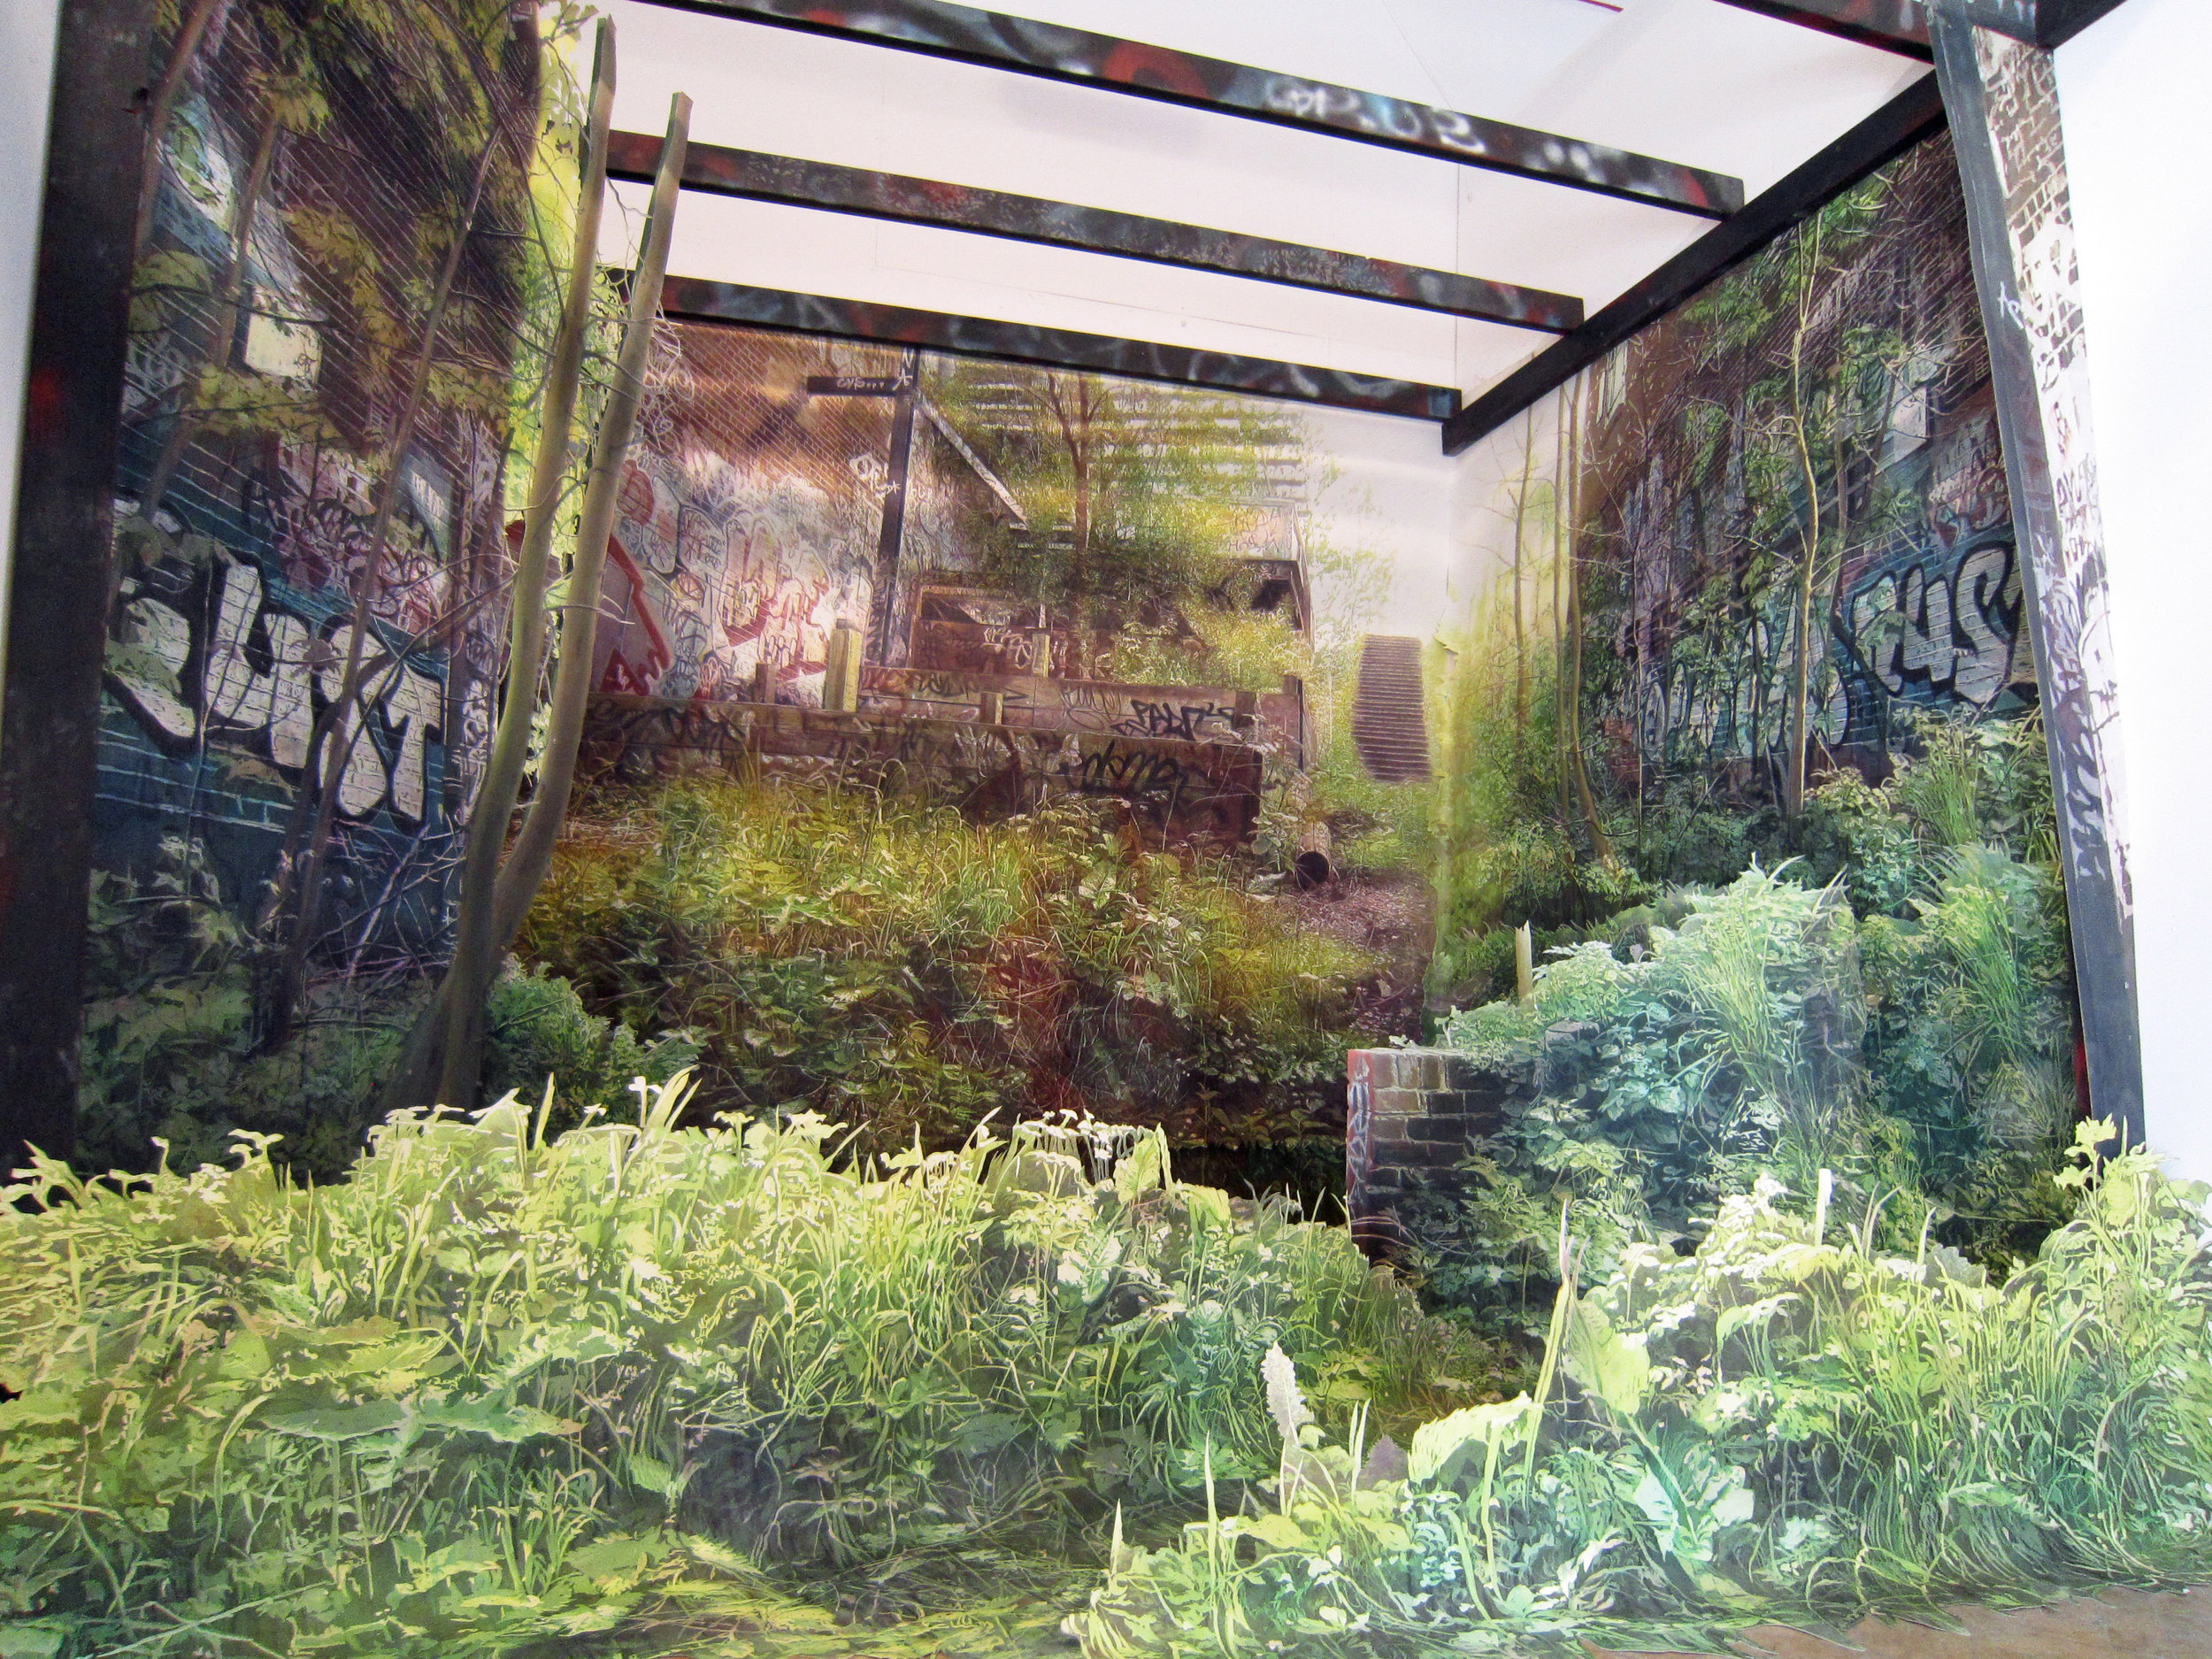 1st Prize Winner (£3000): Juliette Losq   Artwork:  Proscenium  (2018)